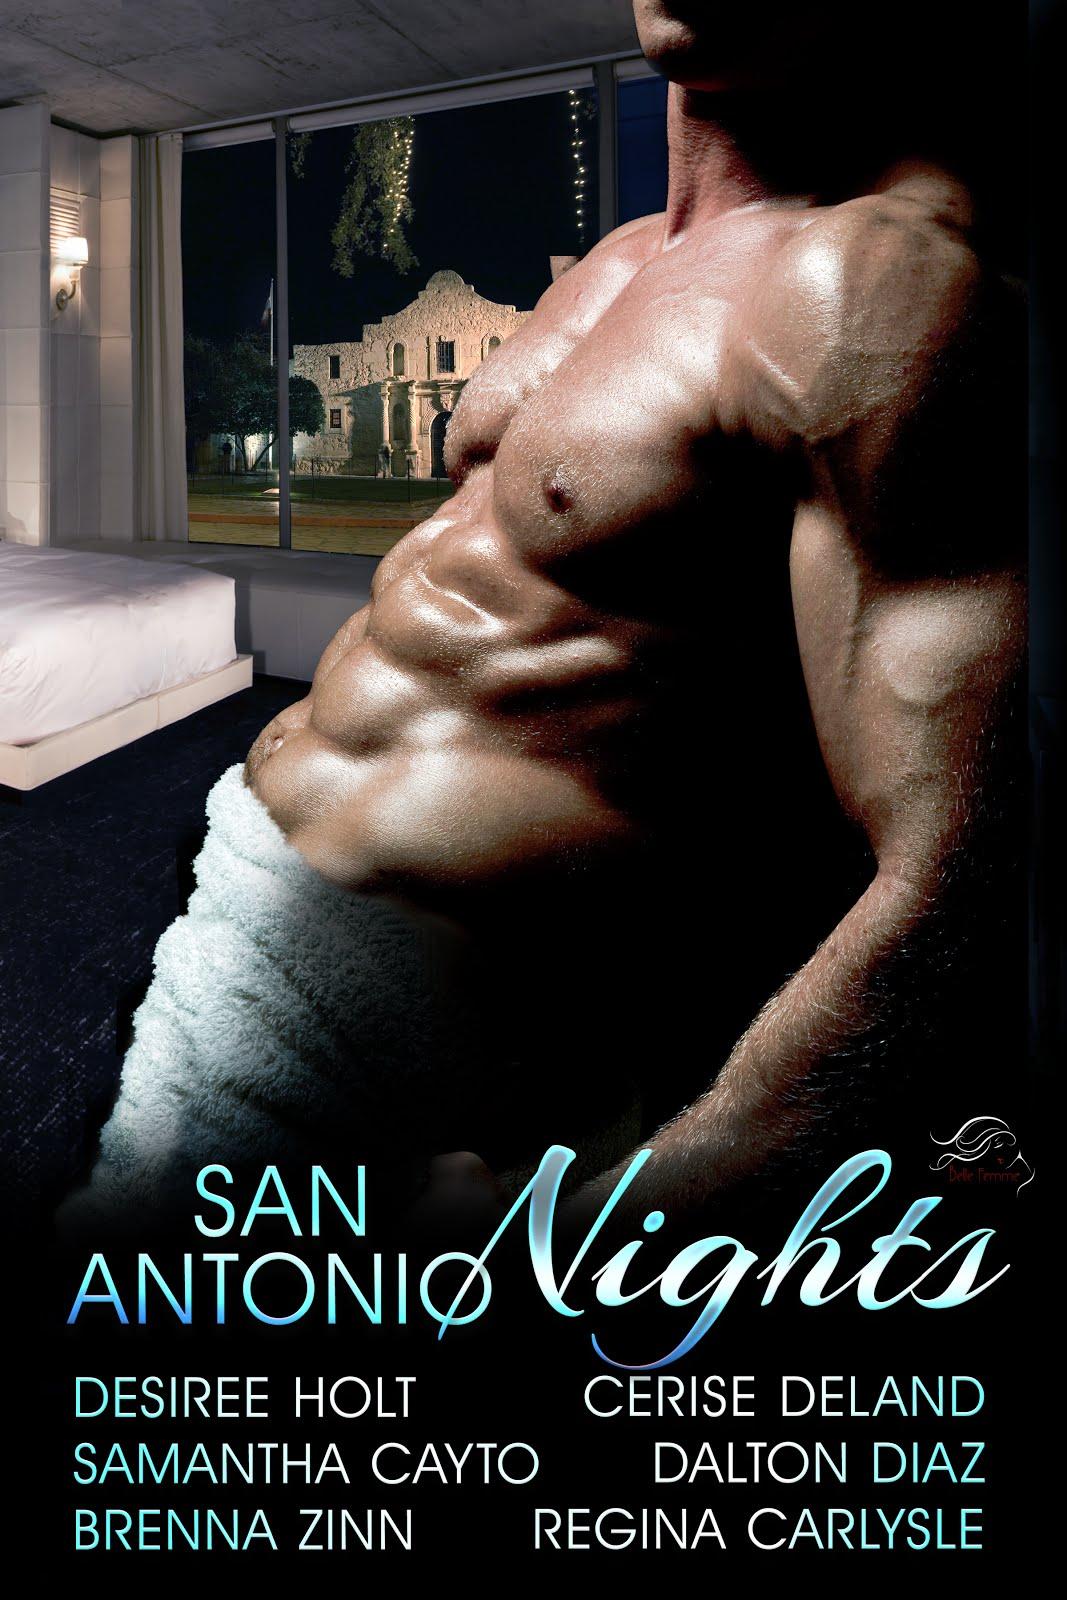 SAN ANTONIO NIGHTS!